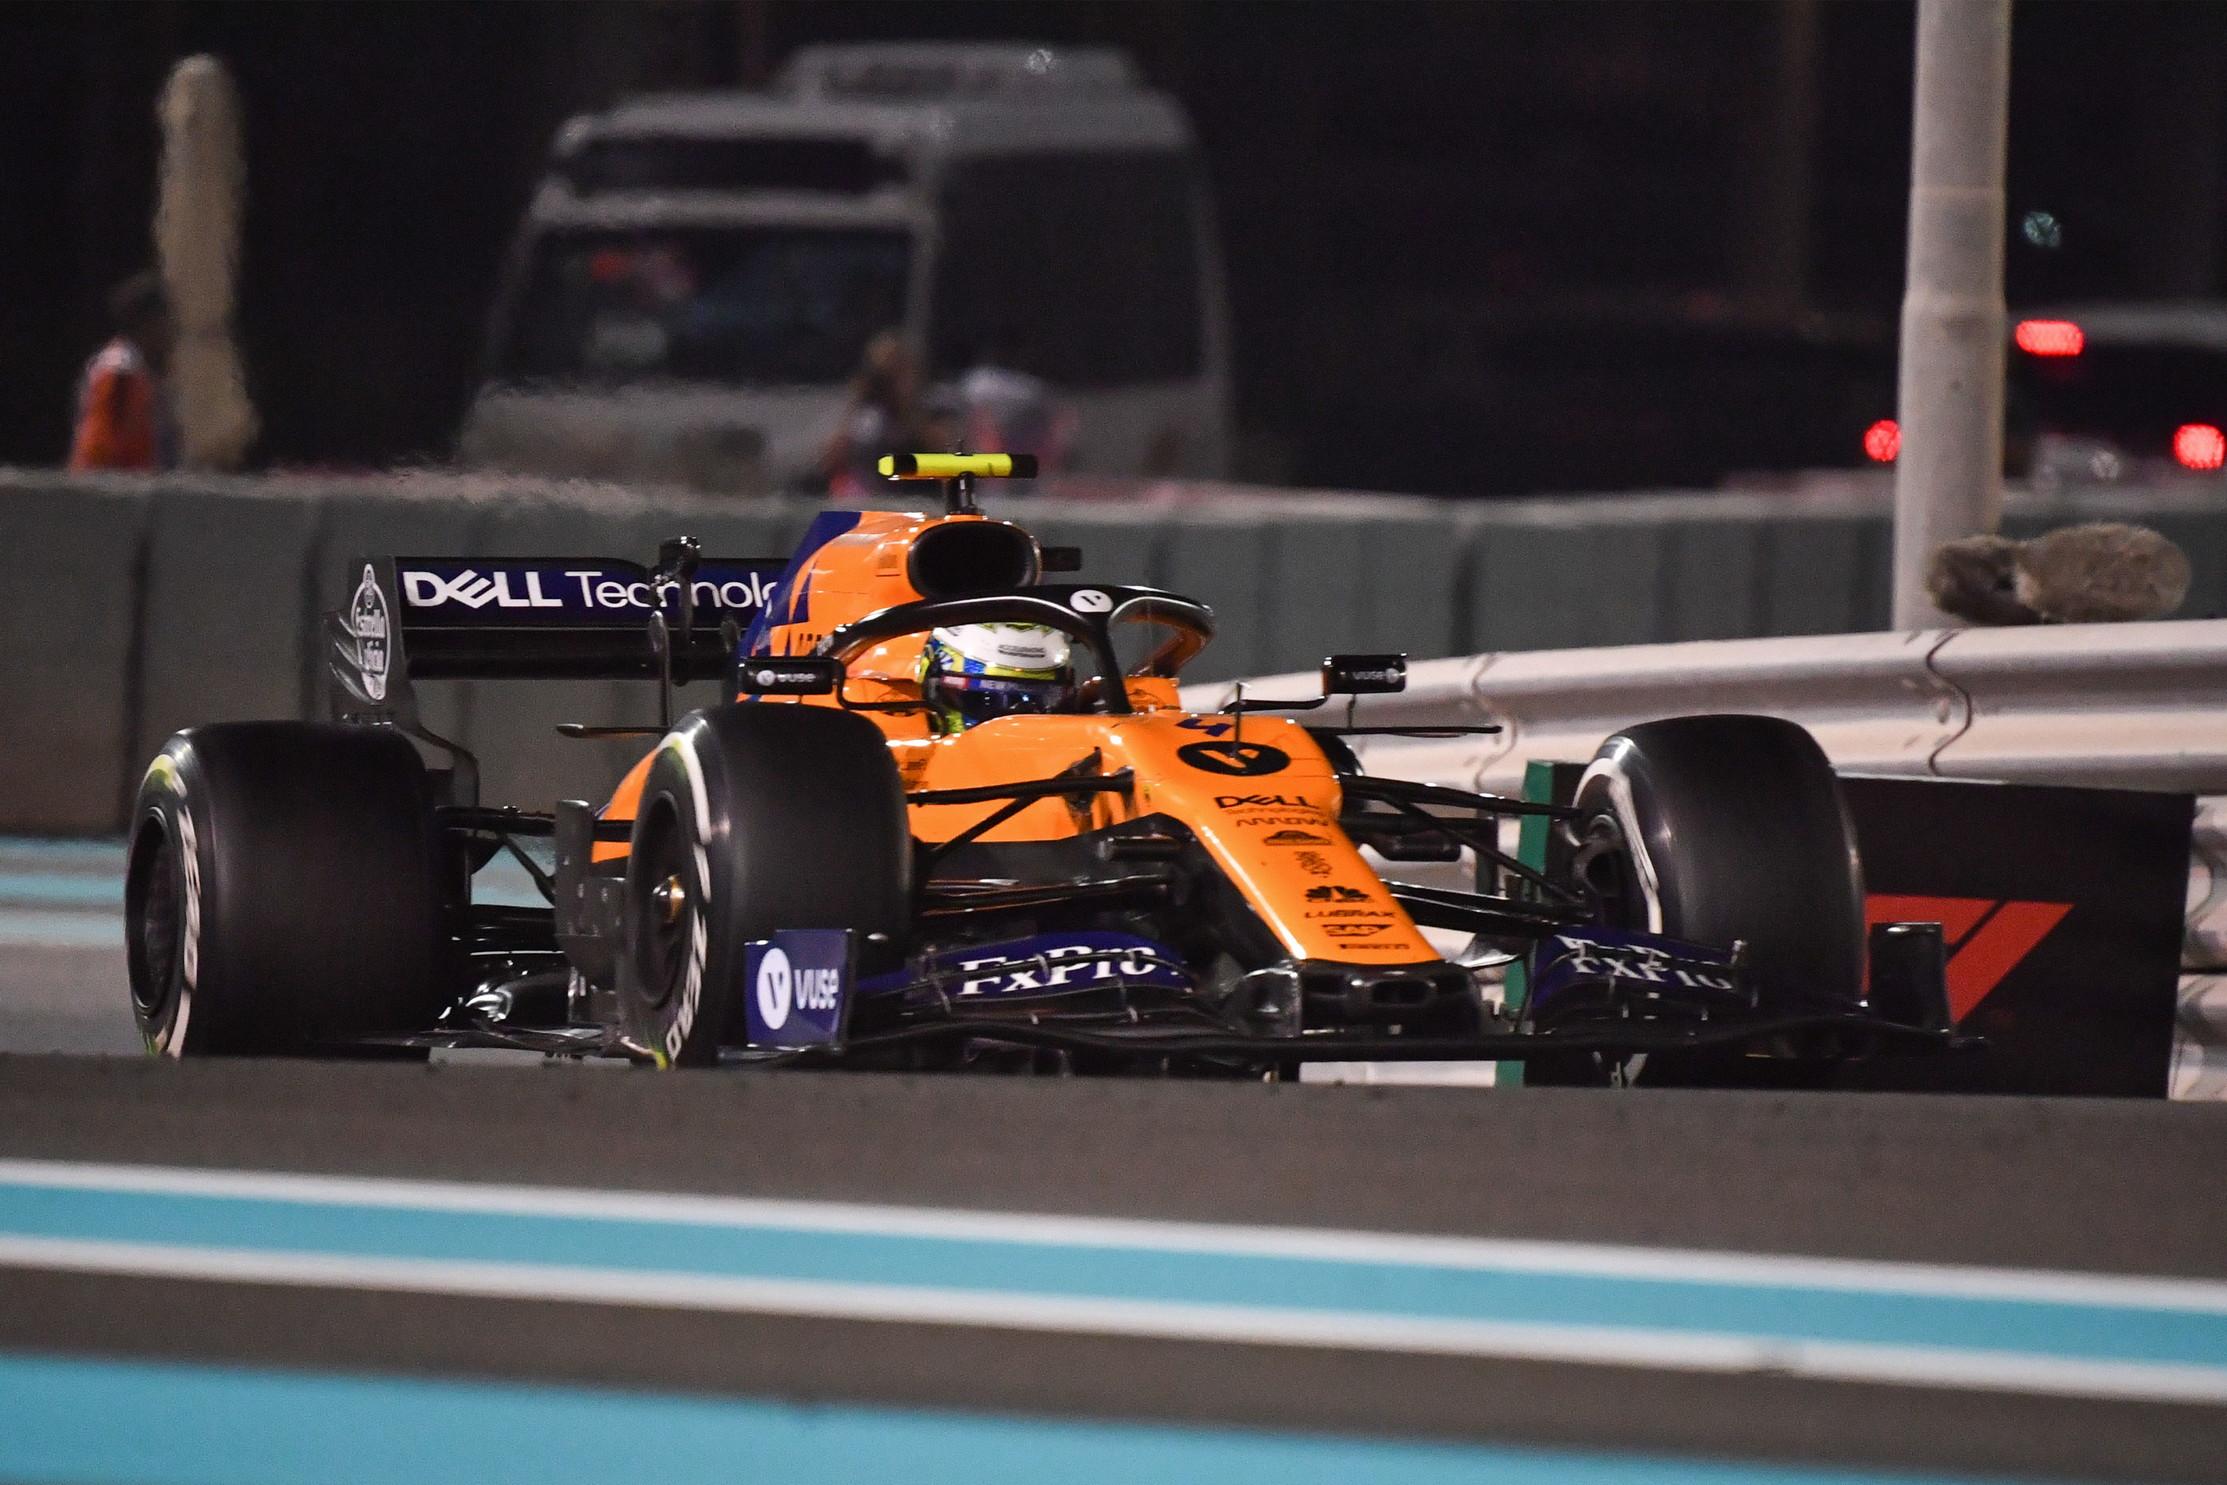 4) McLaren (620 milioni di dollari di valore; 165 milioni di dollari di ricavo)